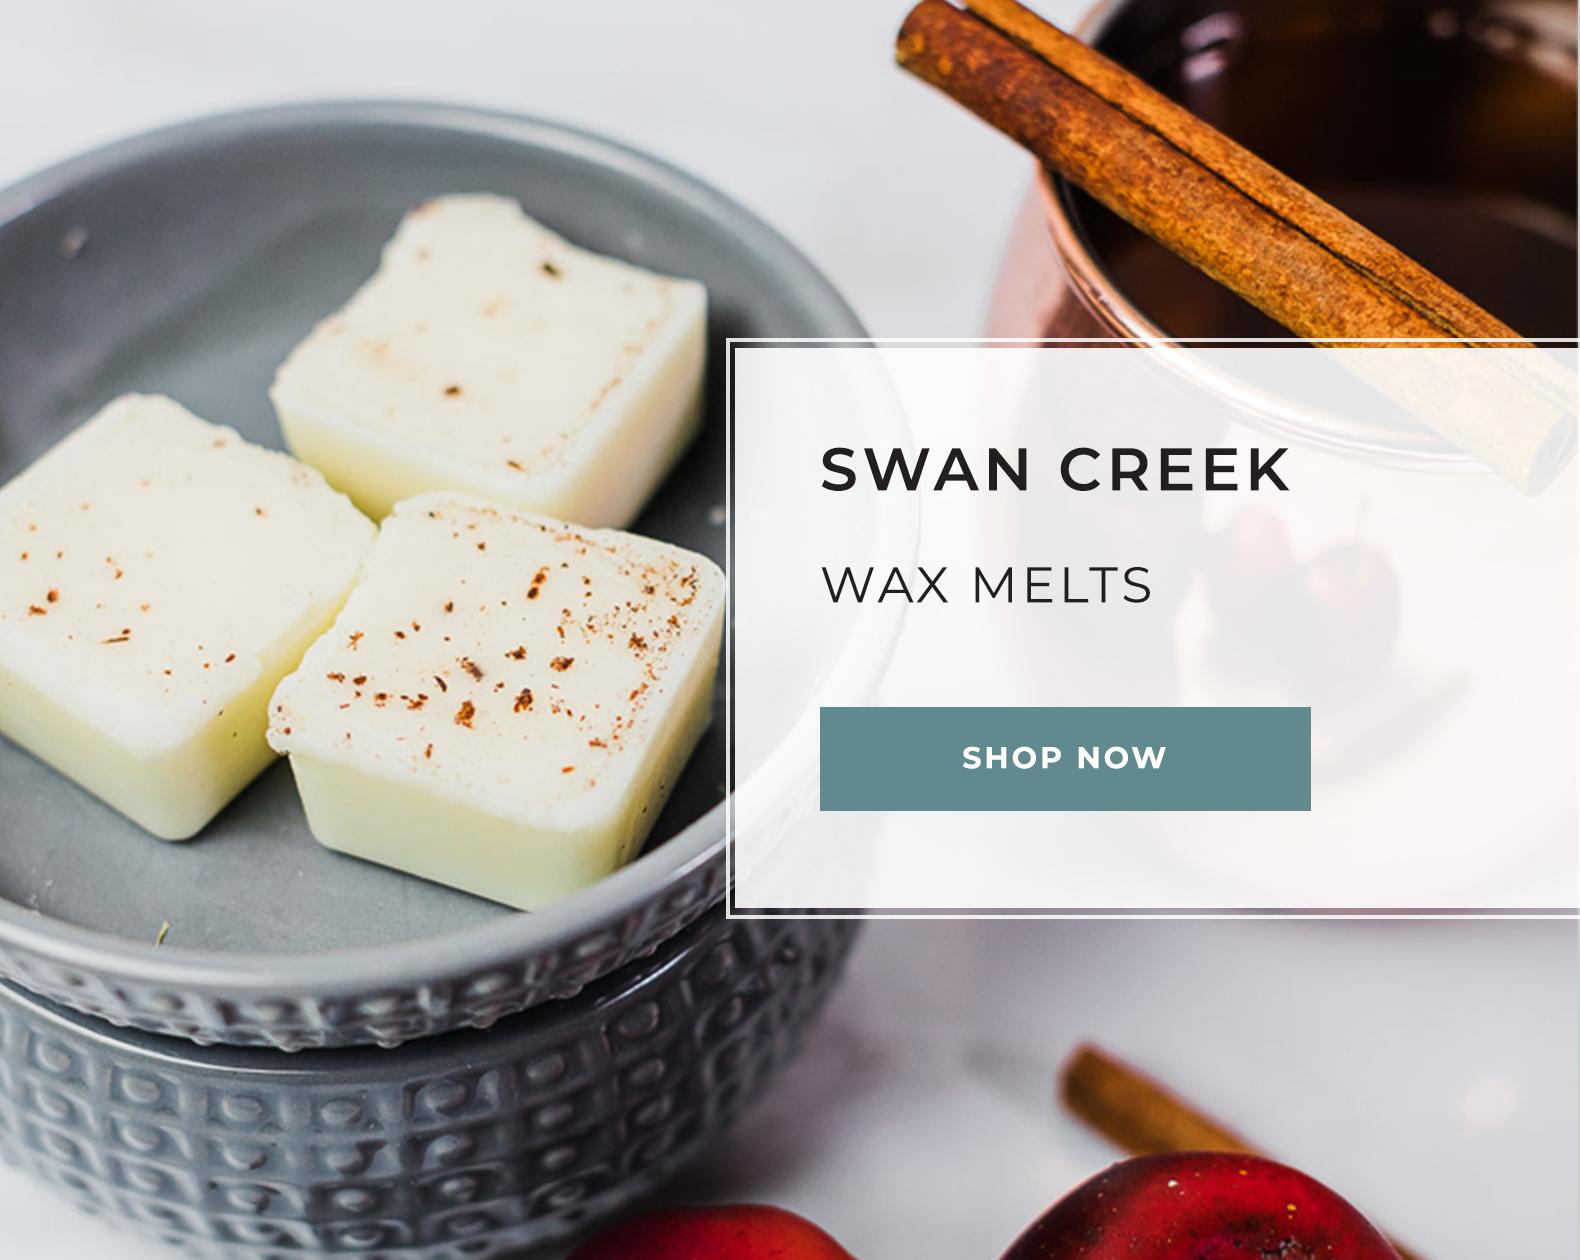 Swan Creek Wax Melts